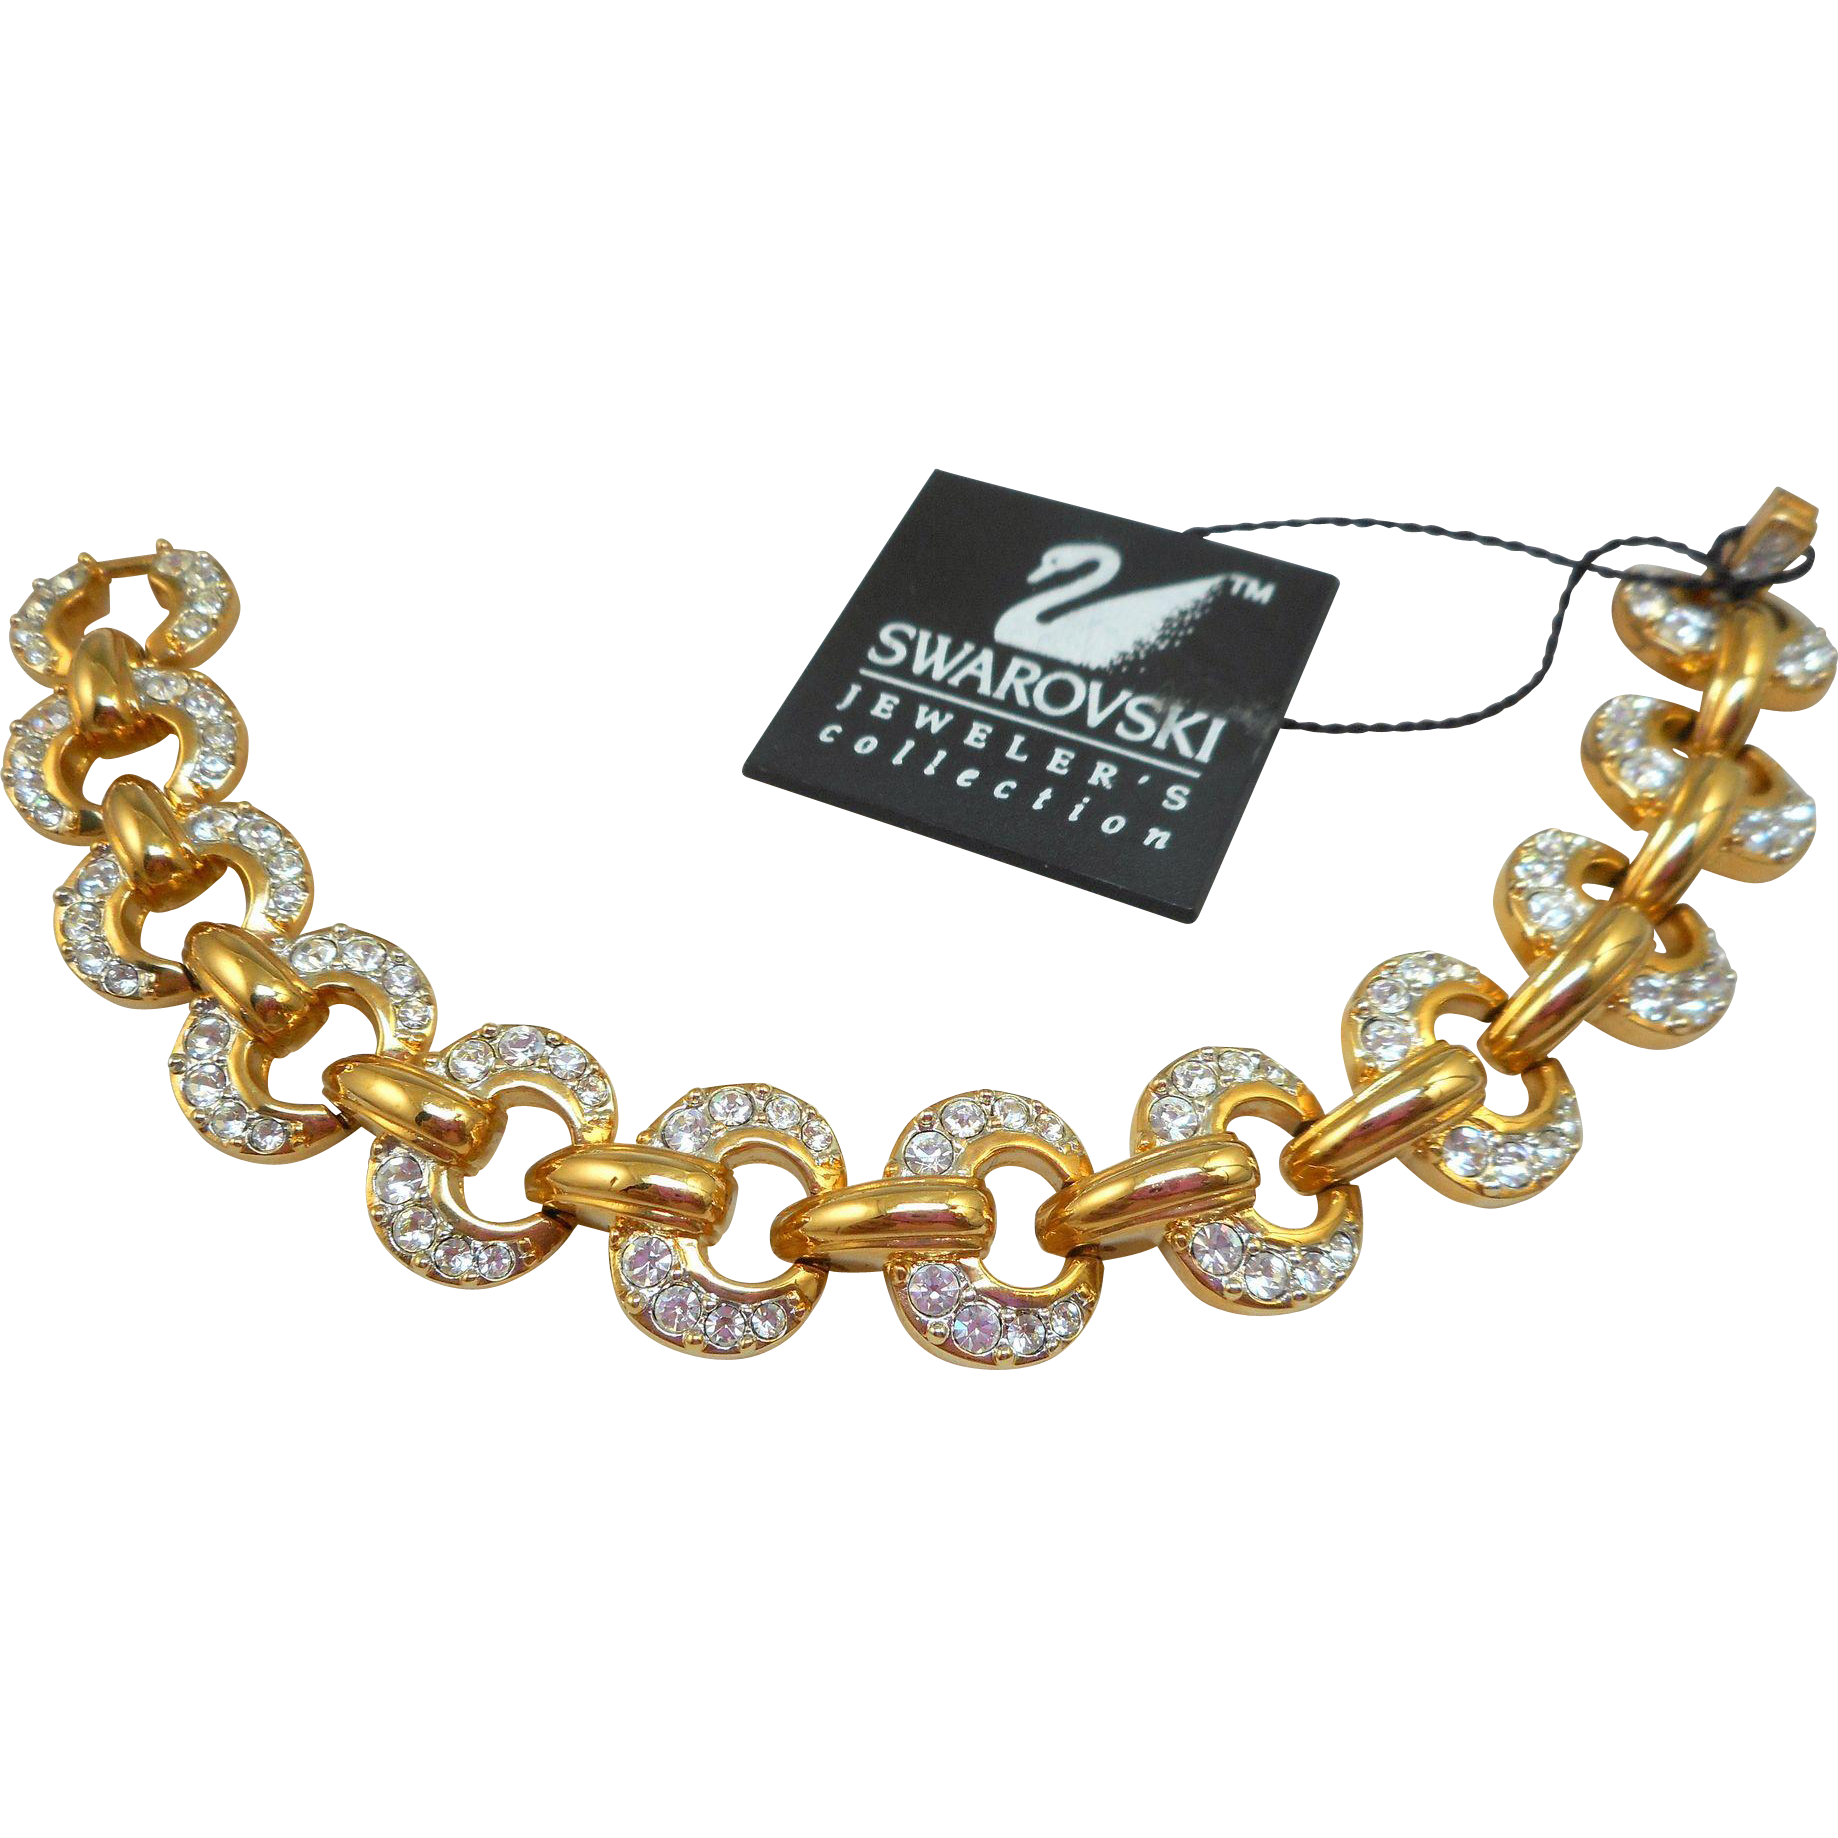 NOS Swarovski Bracelet